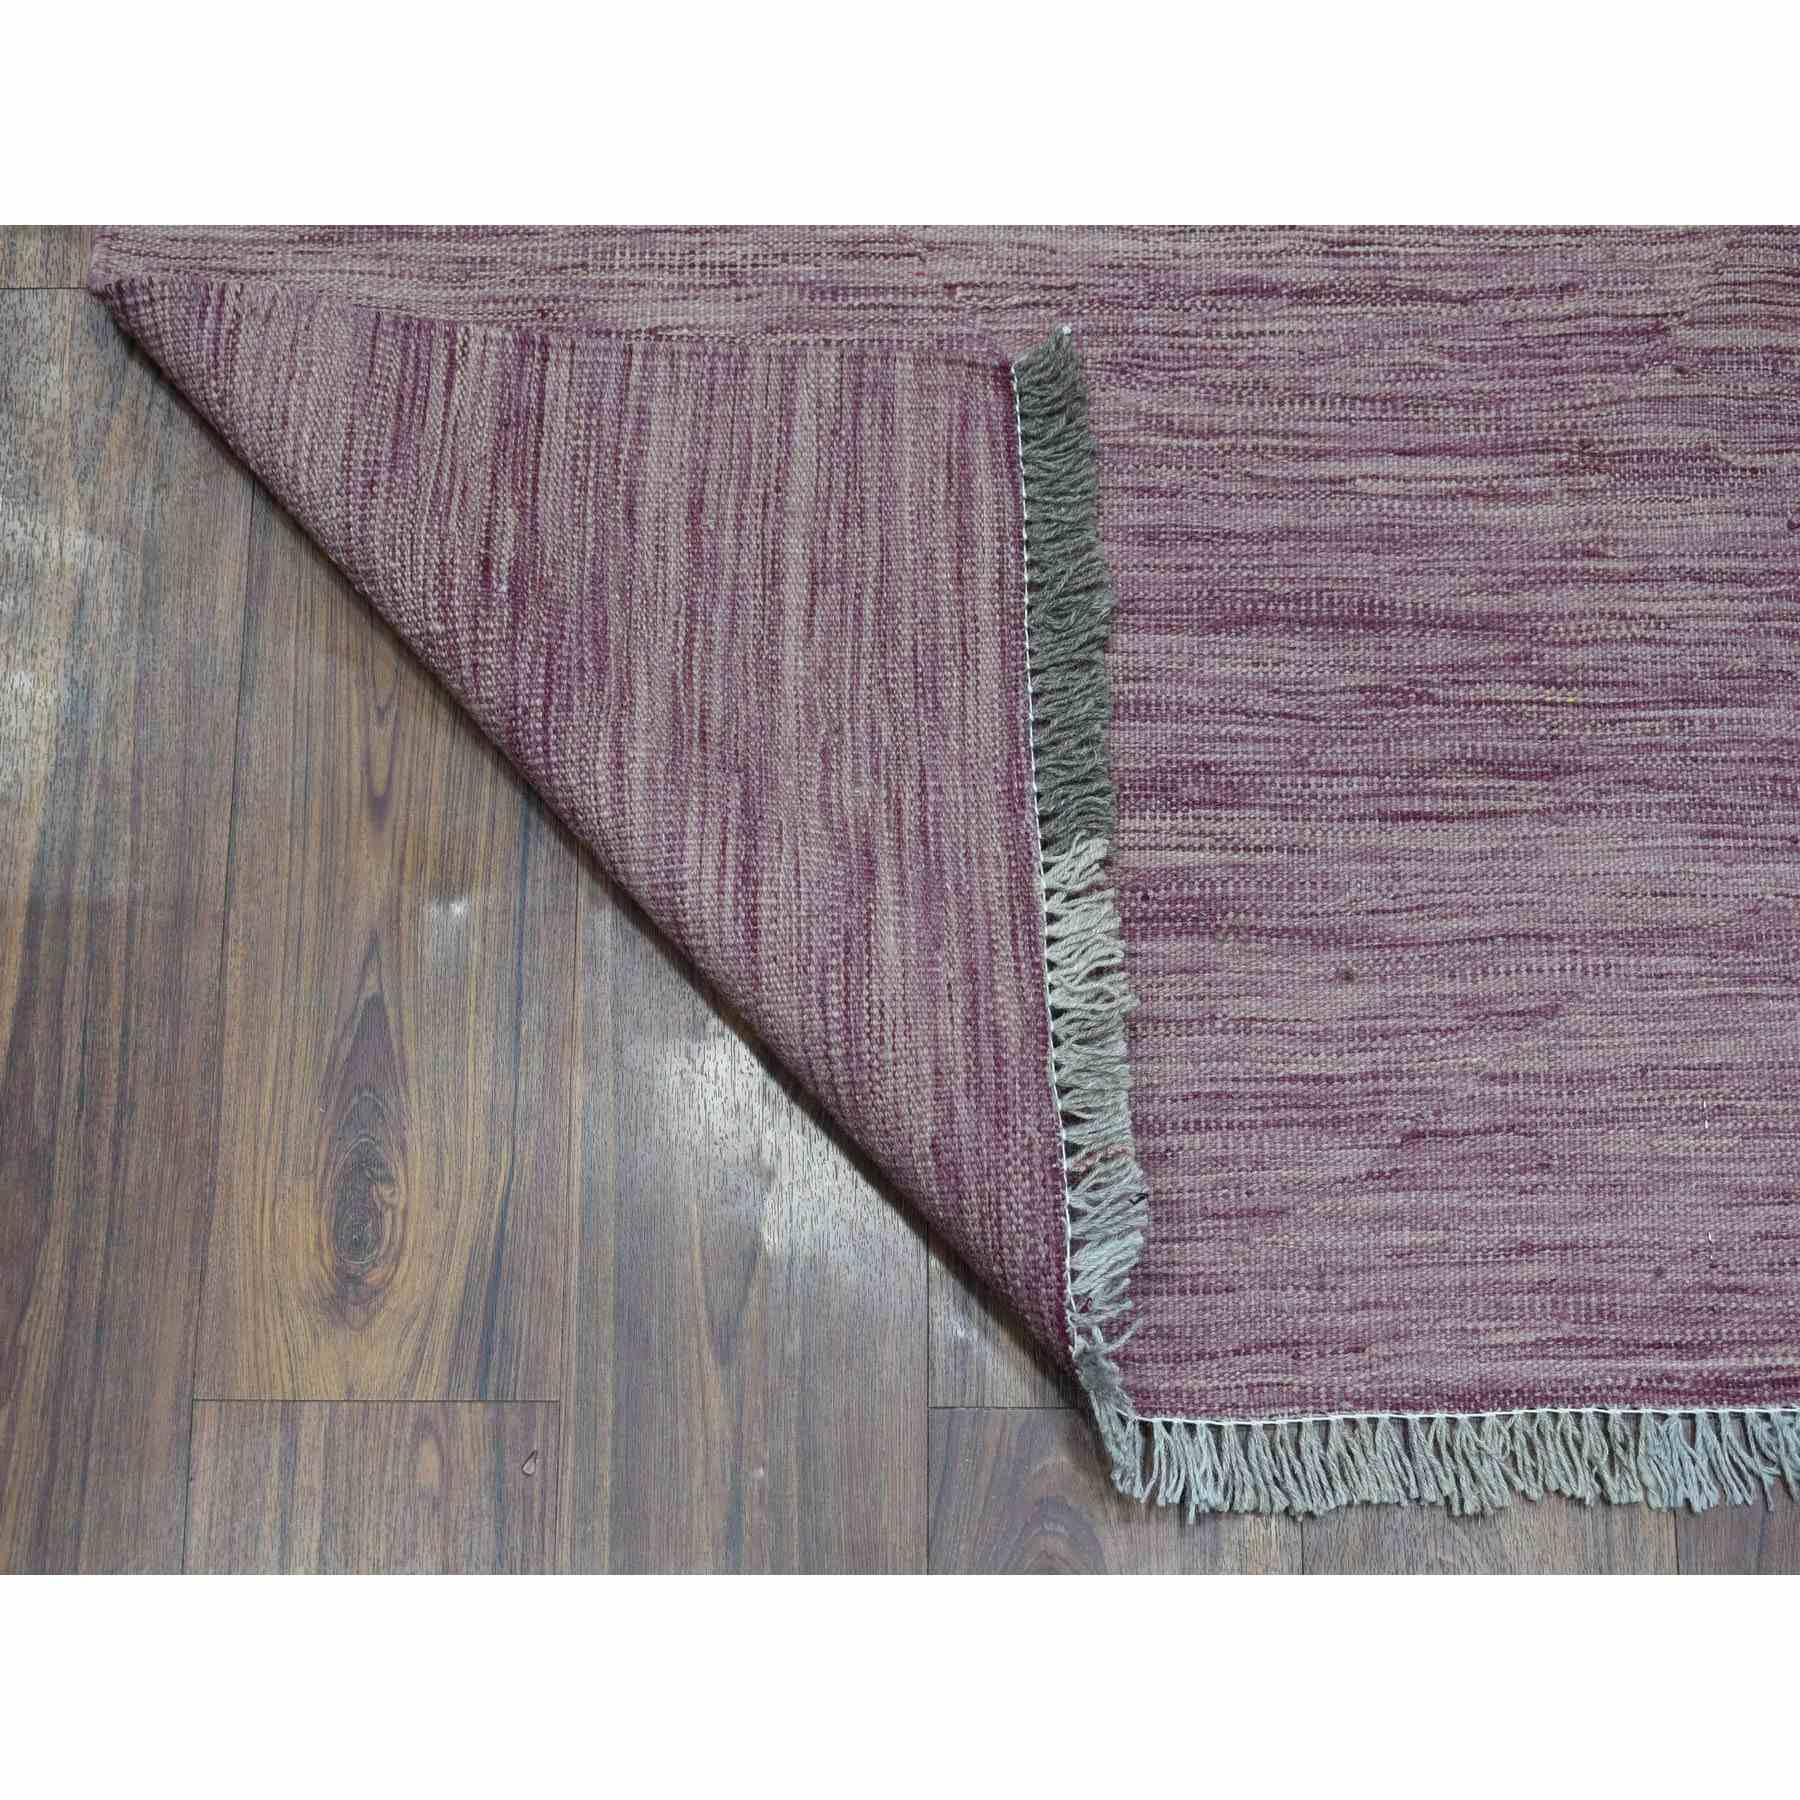 "2'8""x16' Lavender Shades Reversible Kilim Pure Wool Hand Woven XL Runner Oriental Rug"